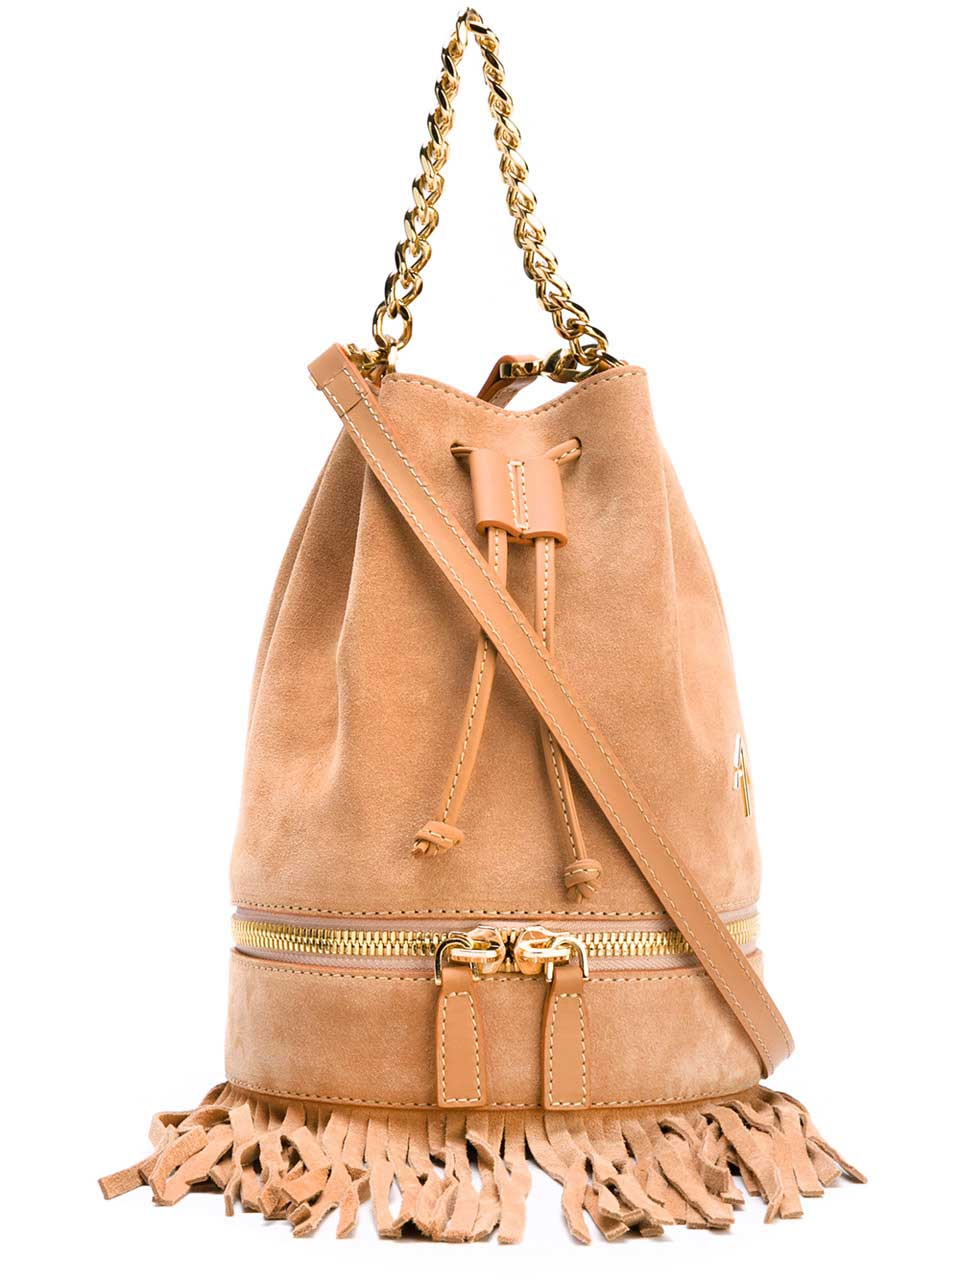 Zeal Fringed Suede Bag, £305, MANU Atelier. http://www.theshopatbluebird.com